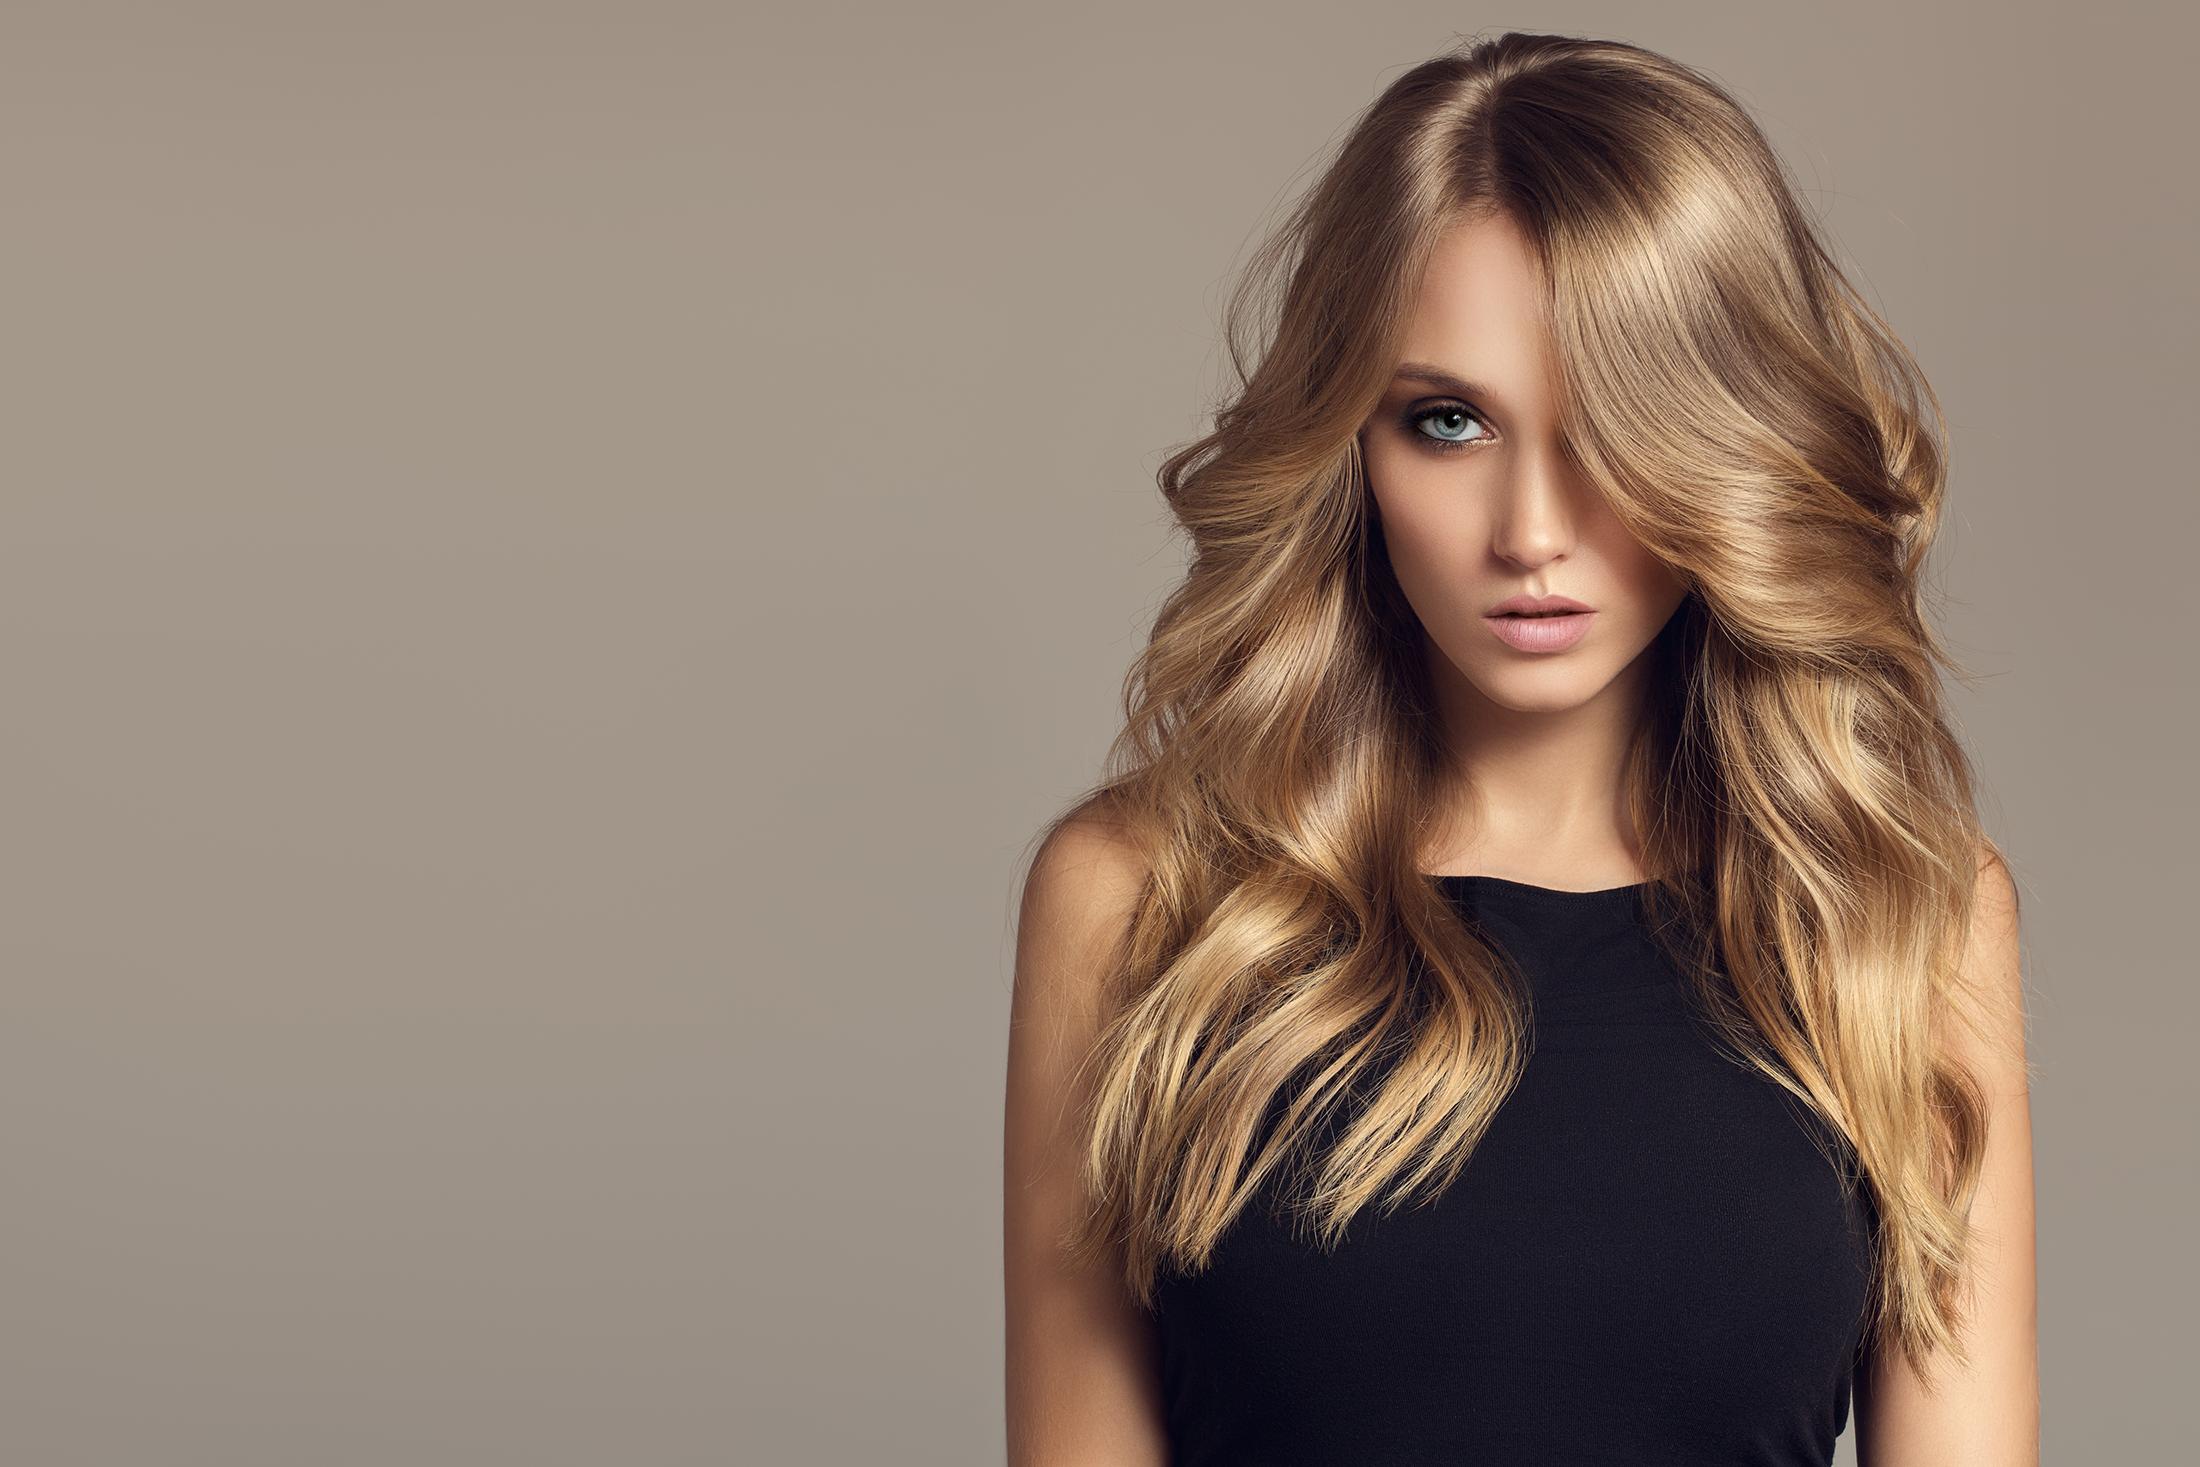 Hair Models Blackthesalon